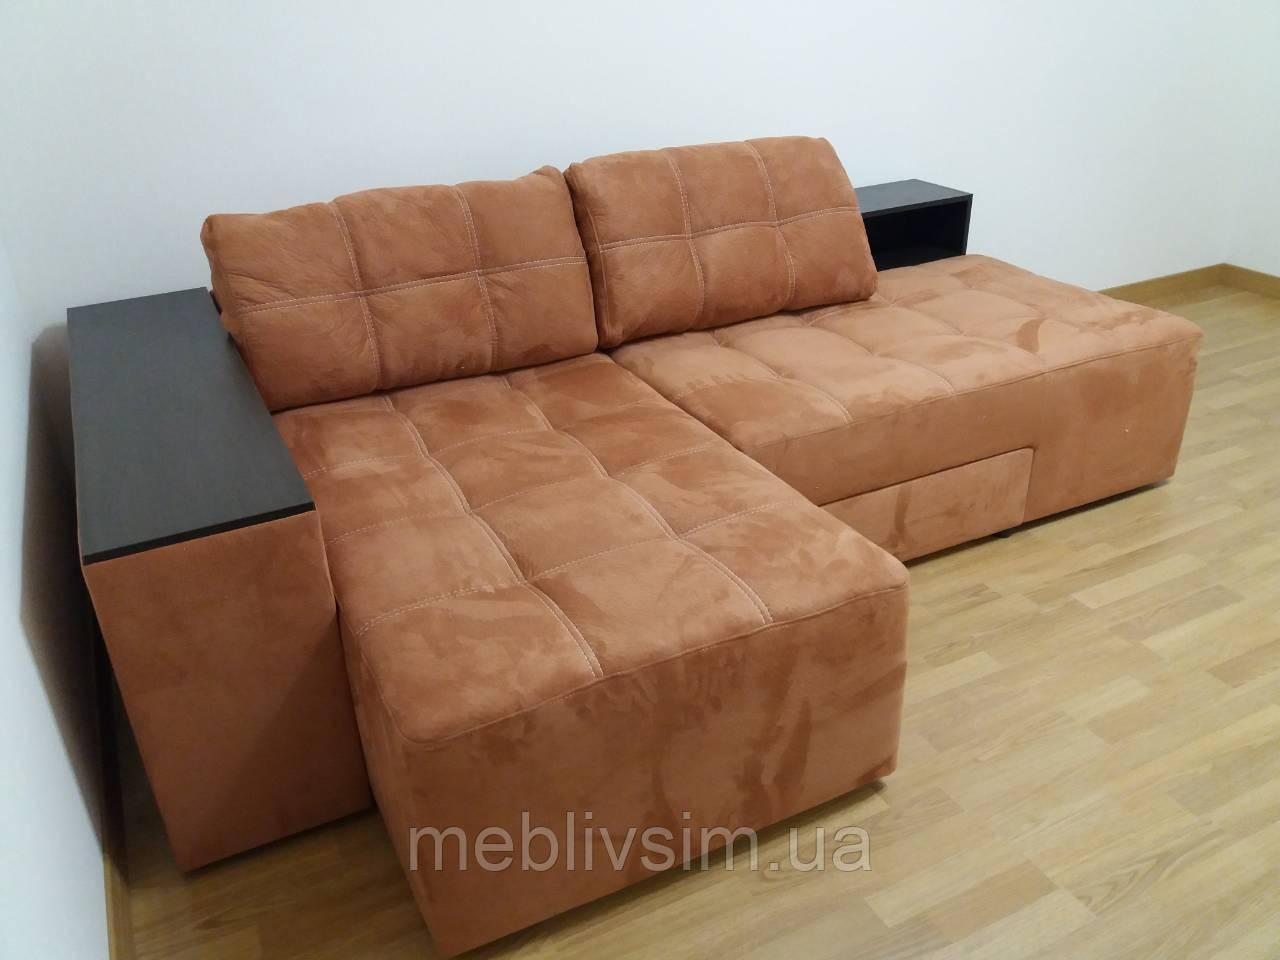 Угловой диван Домино ЛЯ2